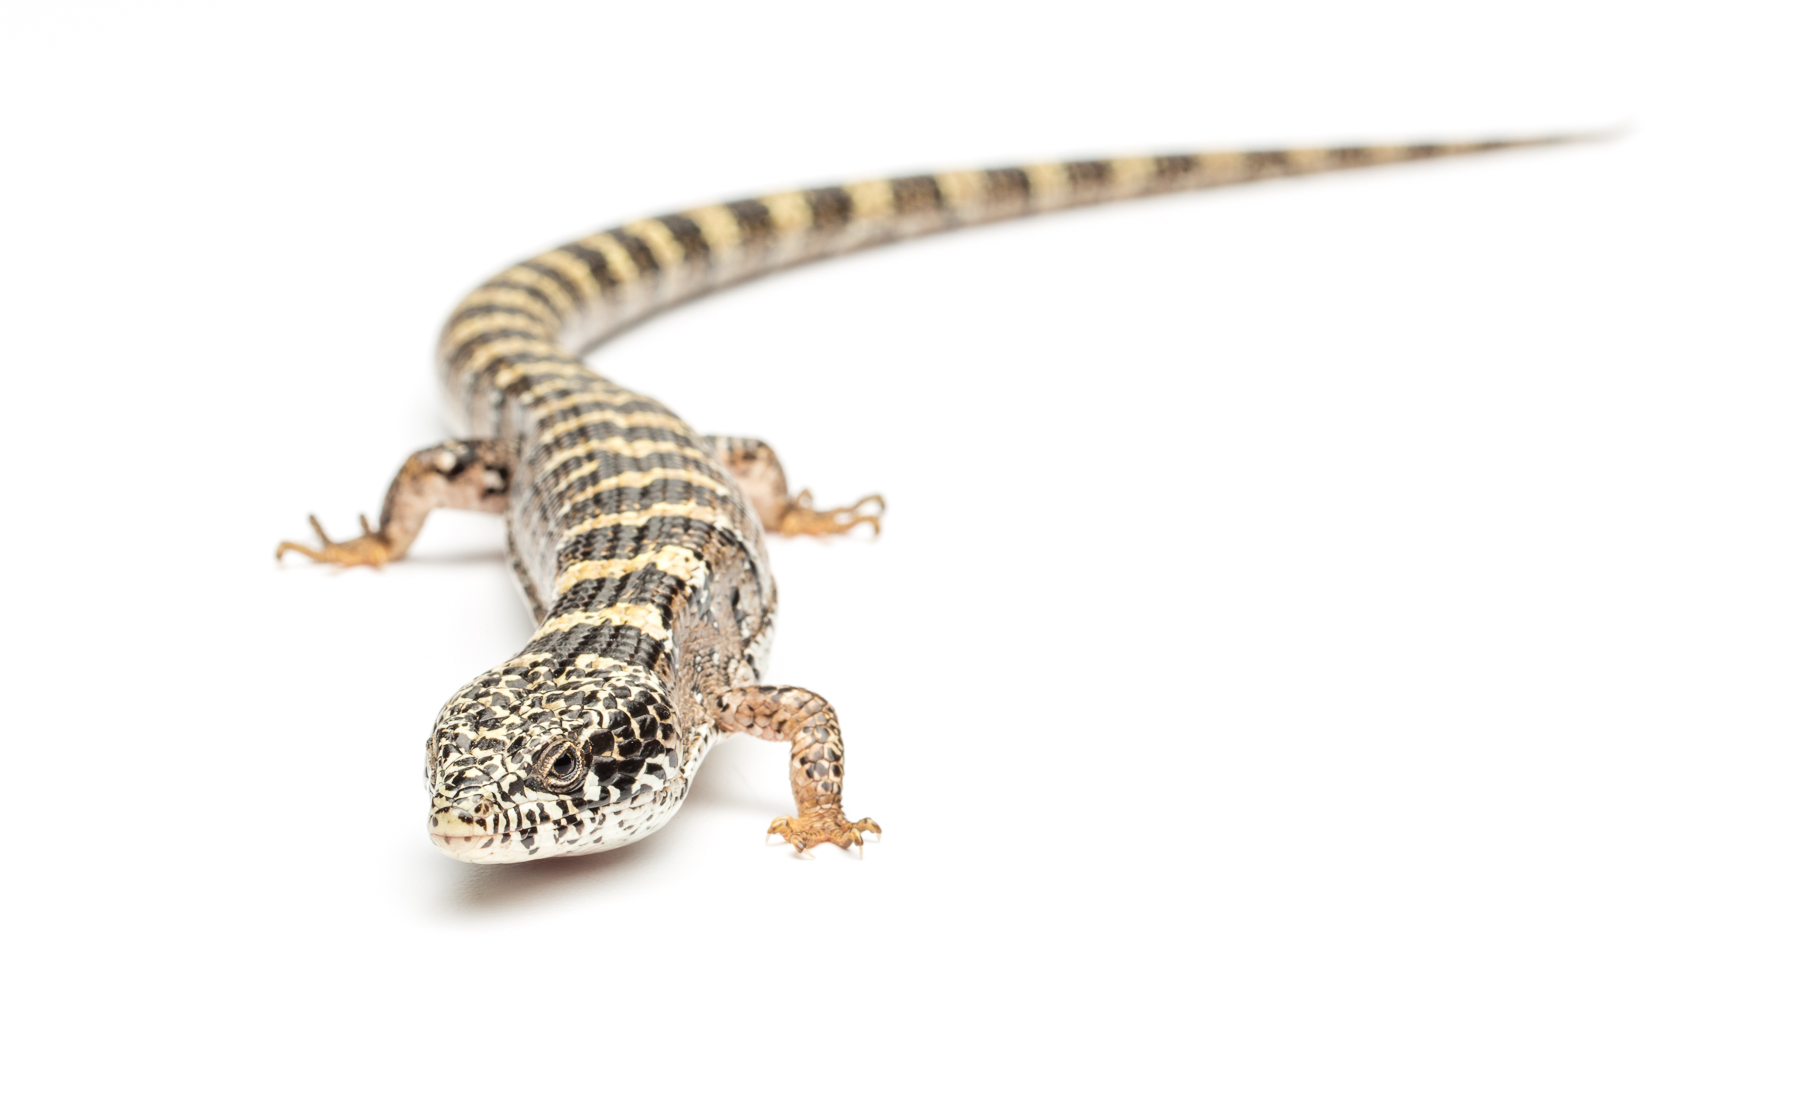 Adult male Madrean alligator lizard